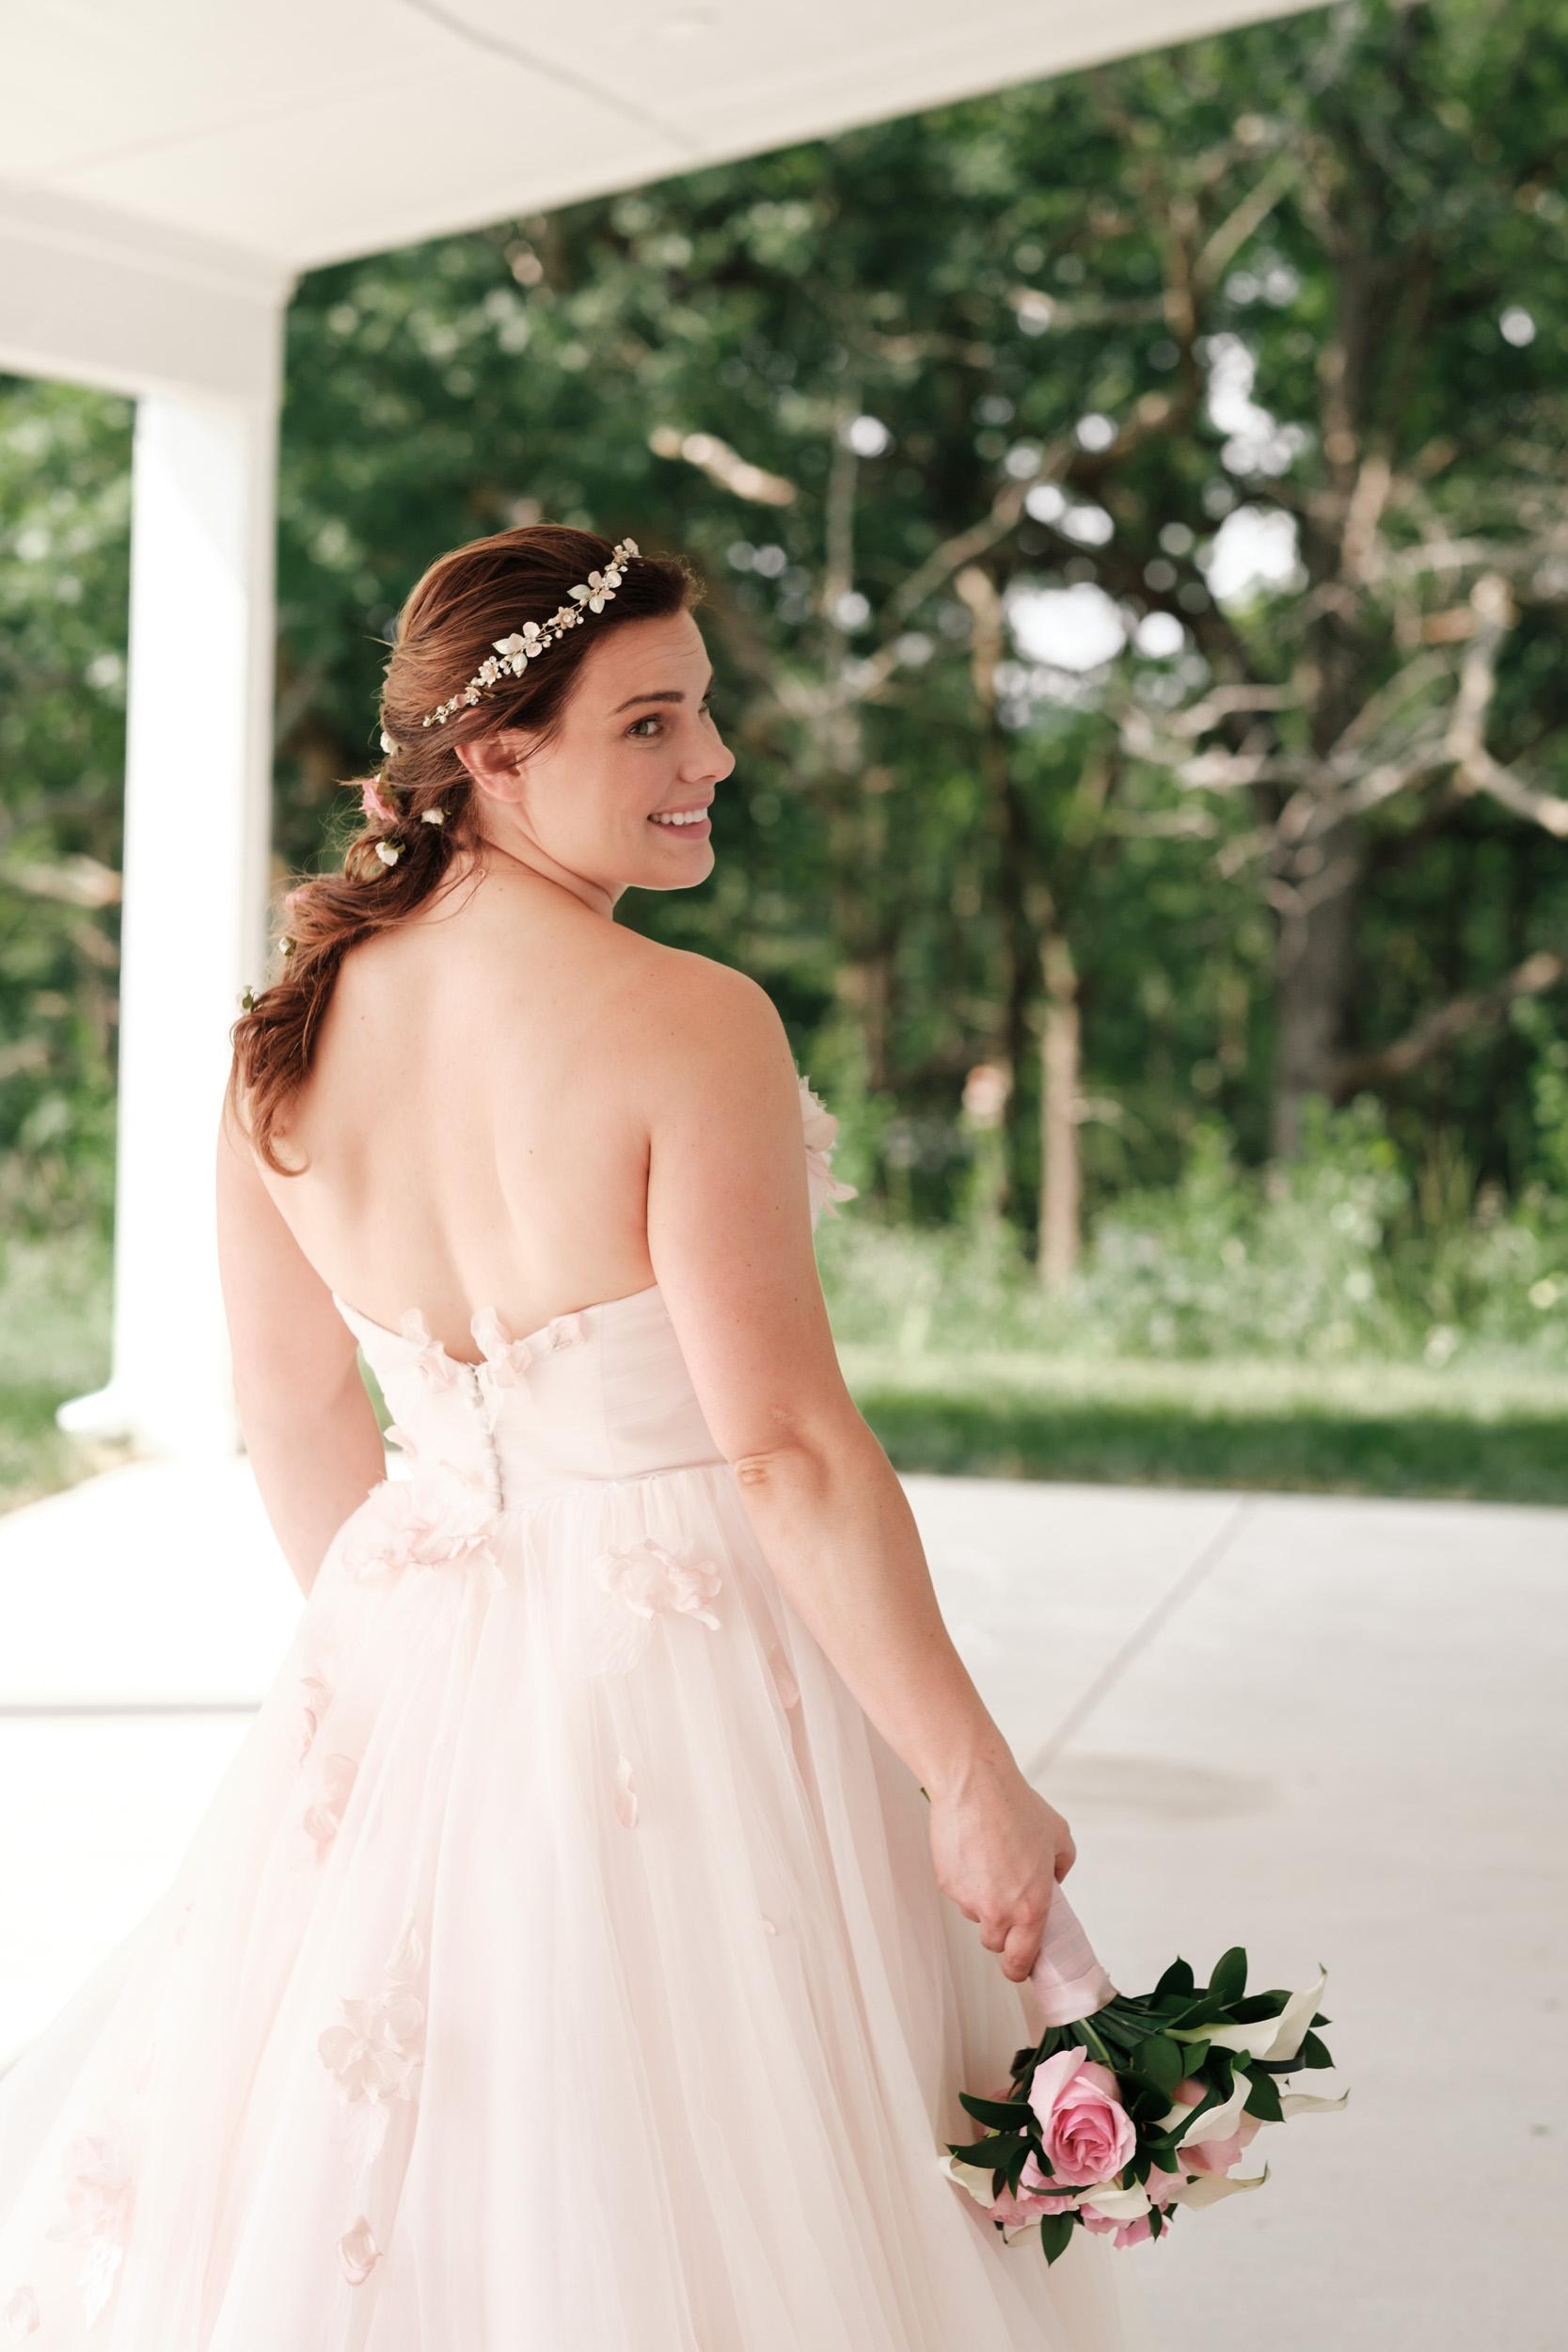 19-06-22-Ryan-Katie-The-Fields-Reserve-Wedding-17.jpg